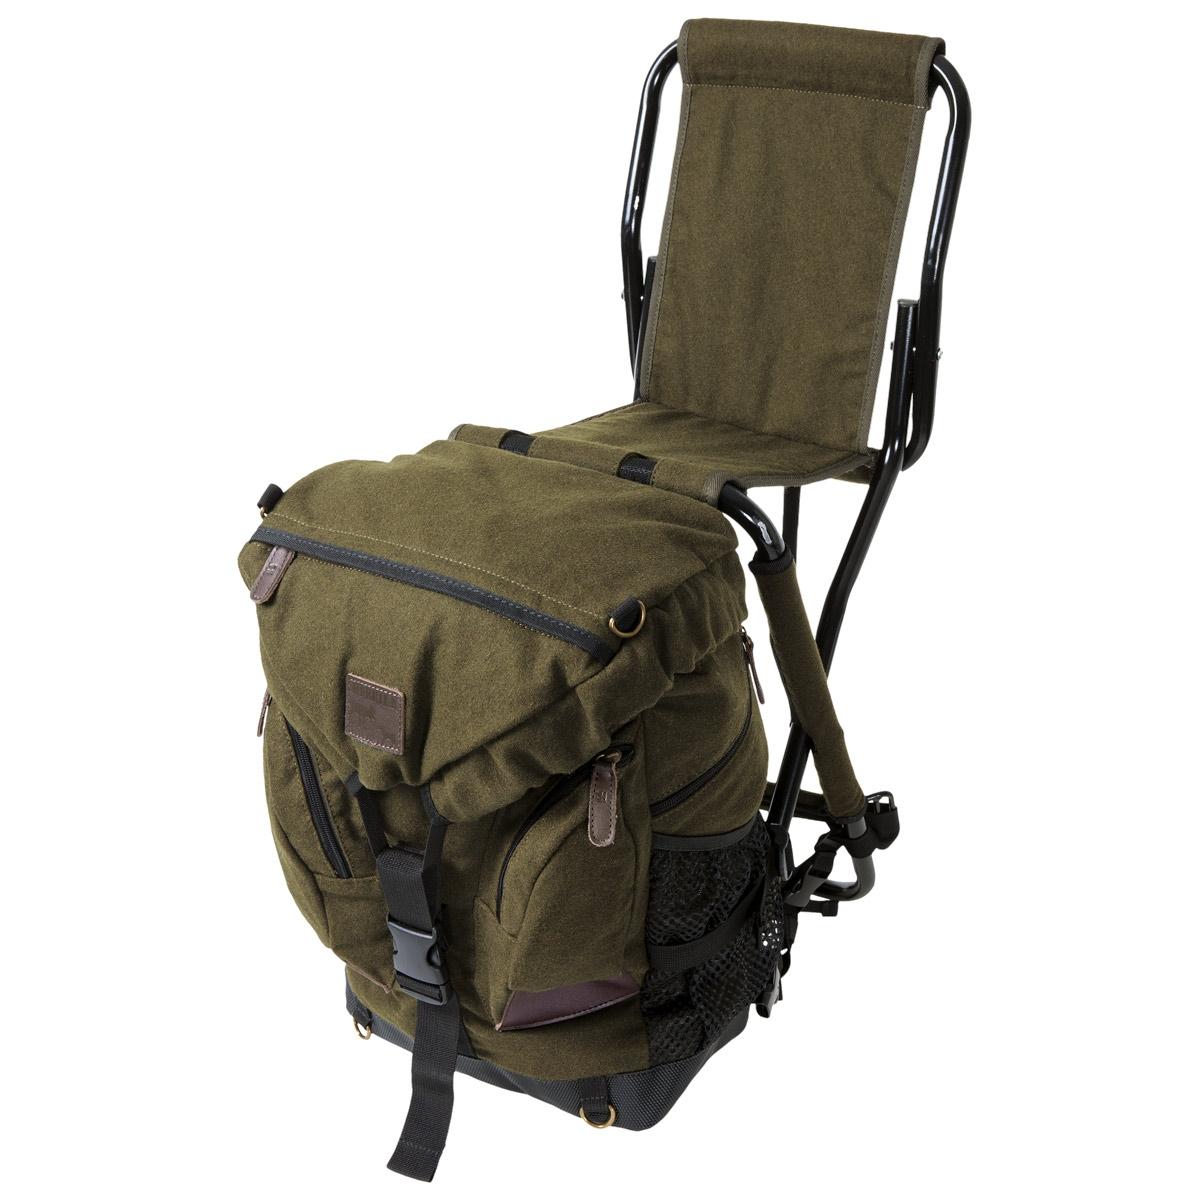 Backpack fishing chair - Image Of Harkila Abisko Rucksack Chair Melton Wool Green